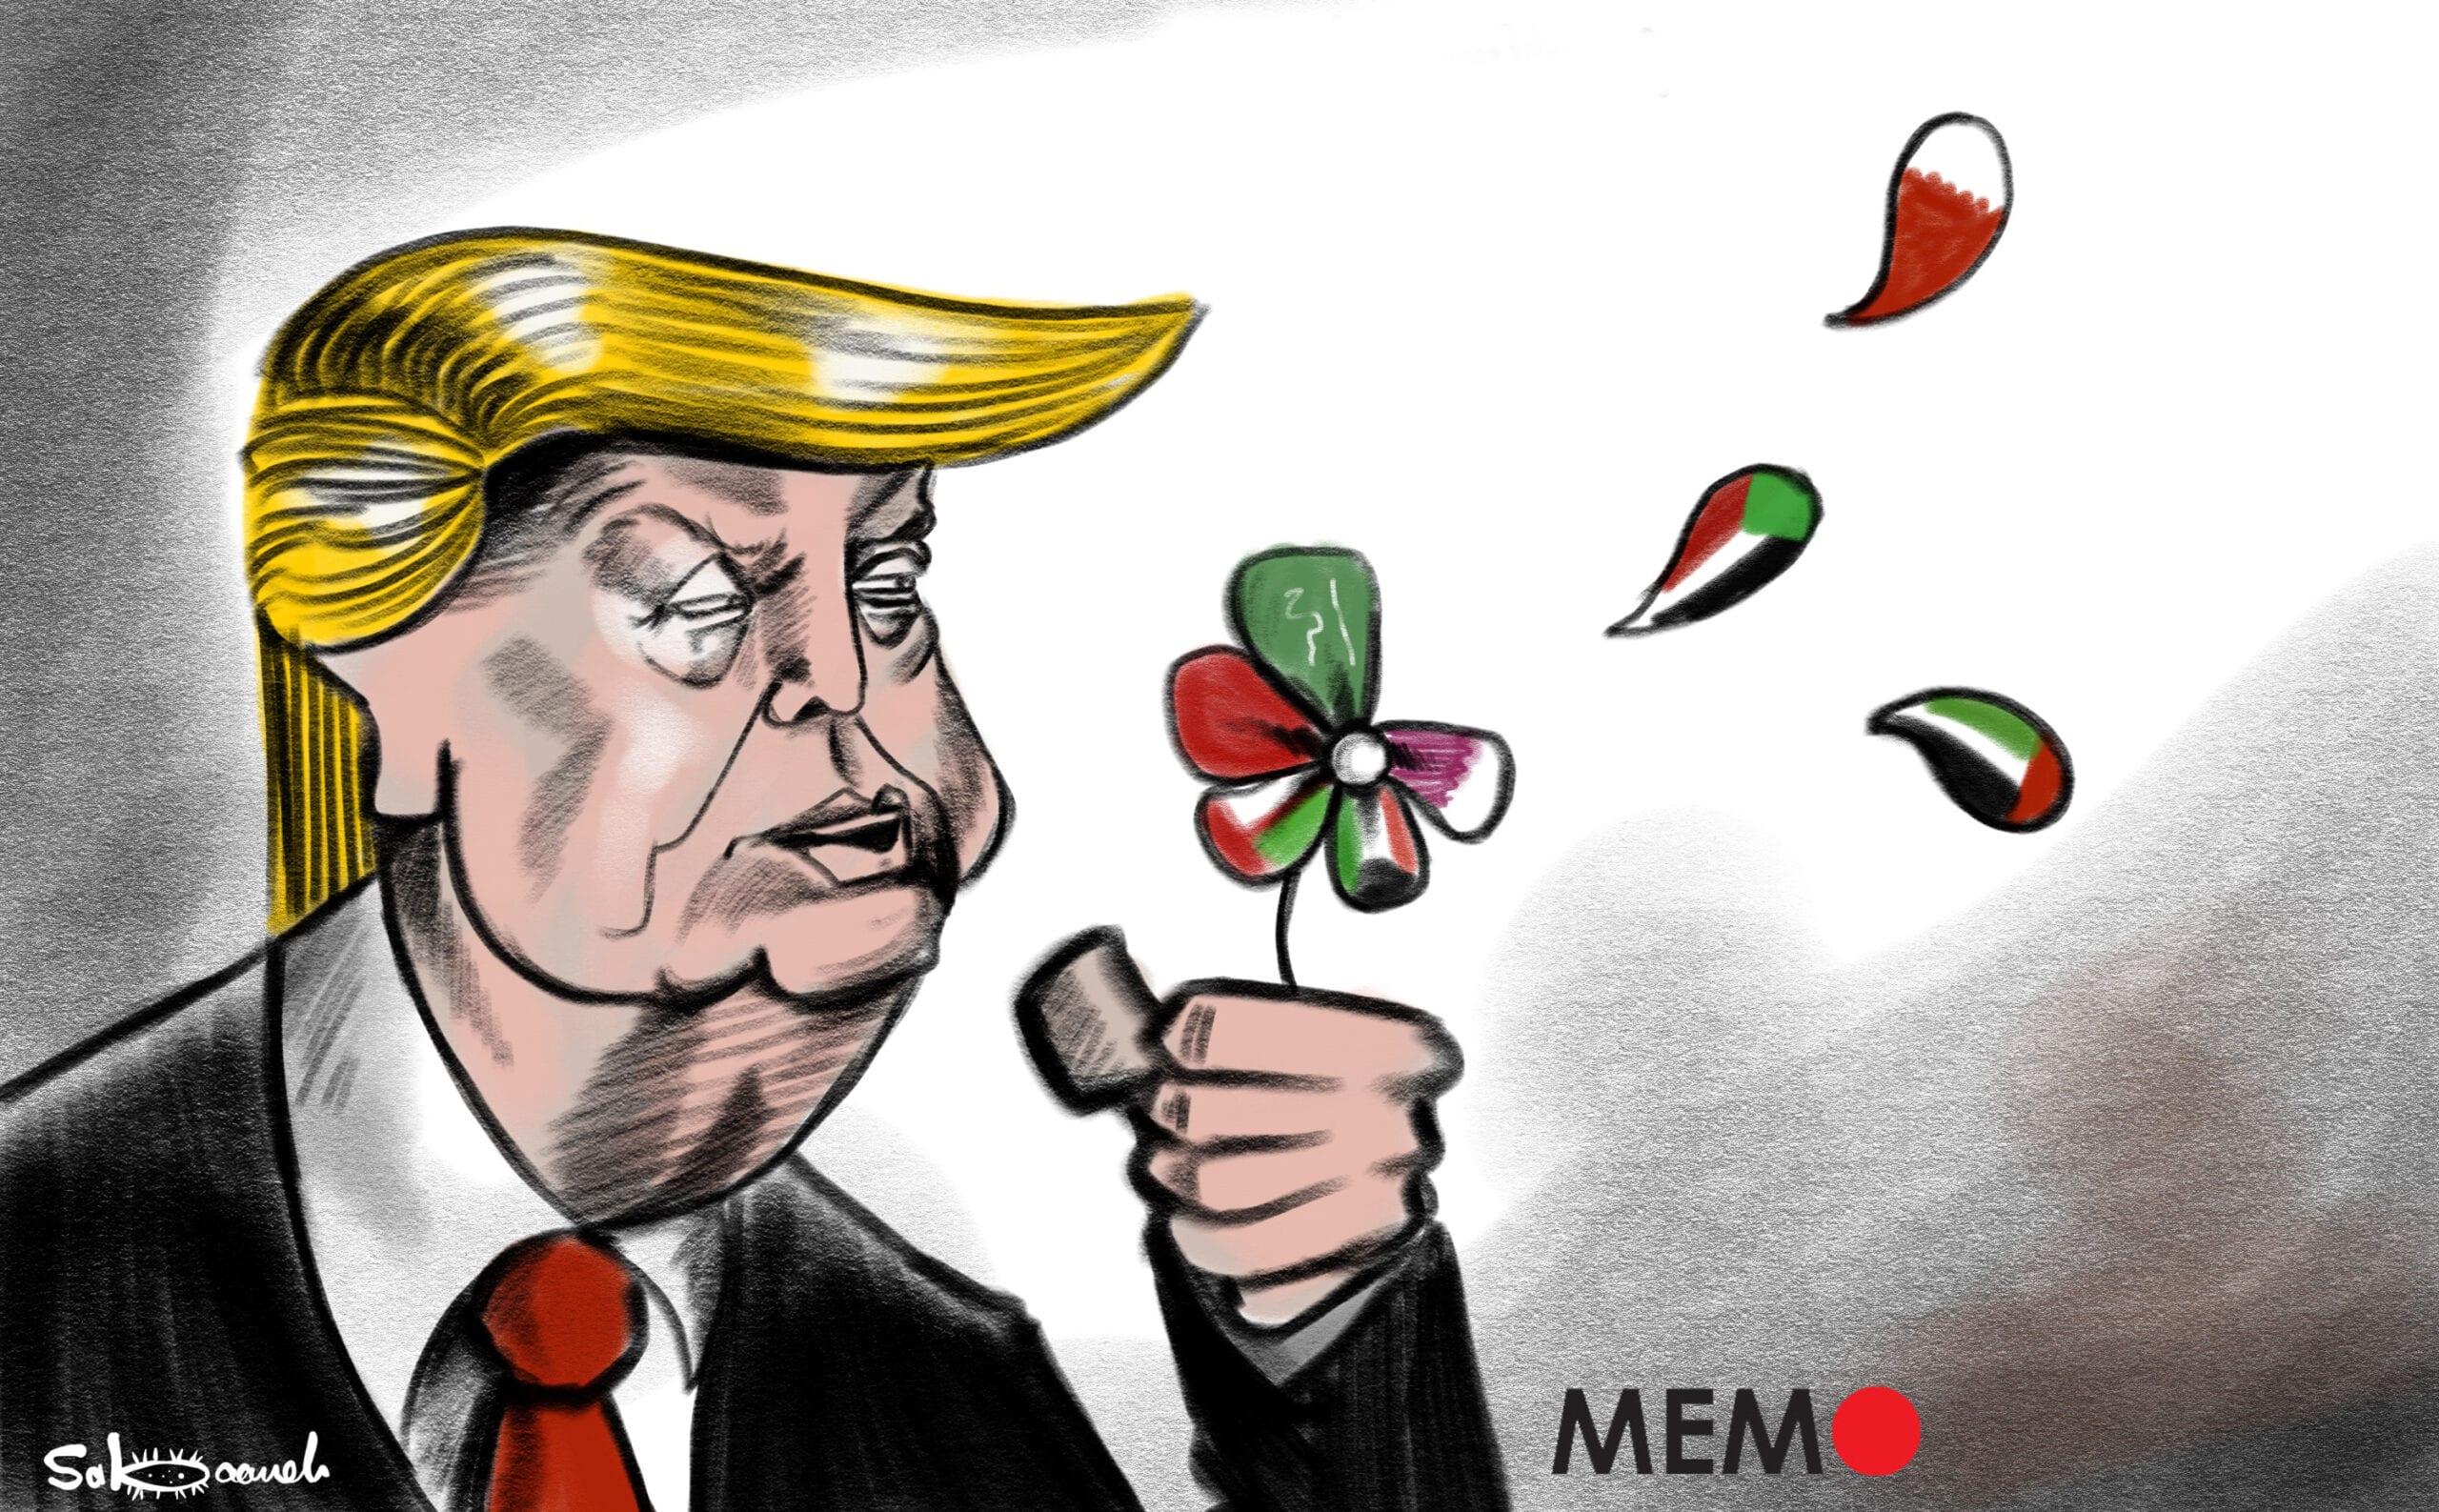 Normalisation with Israel. Who's next? ... - Cartoon [Sabaaneh/MiddleEastMonitor]